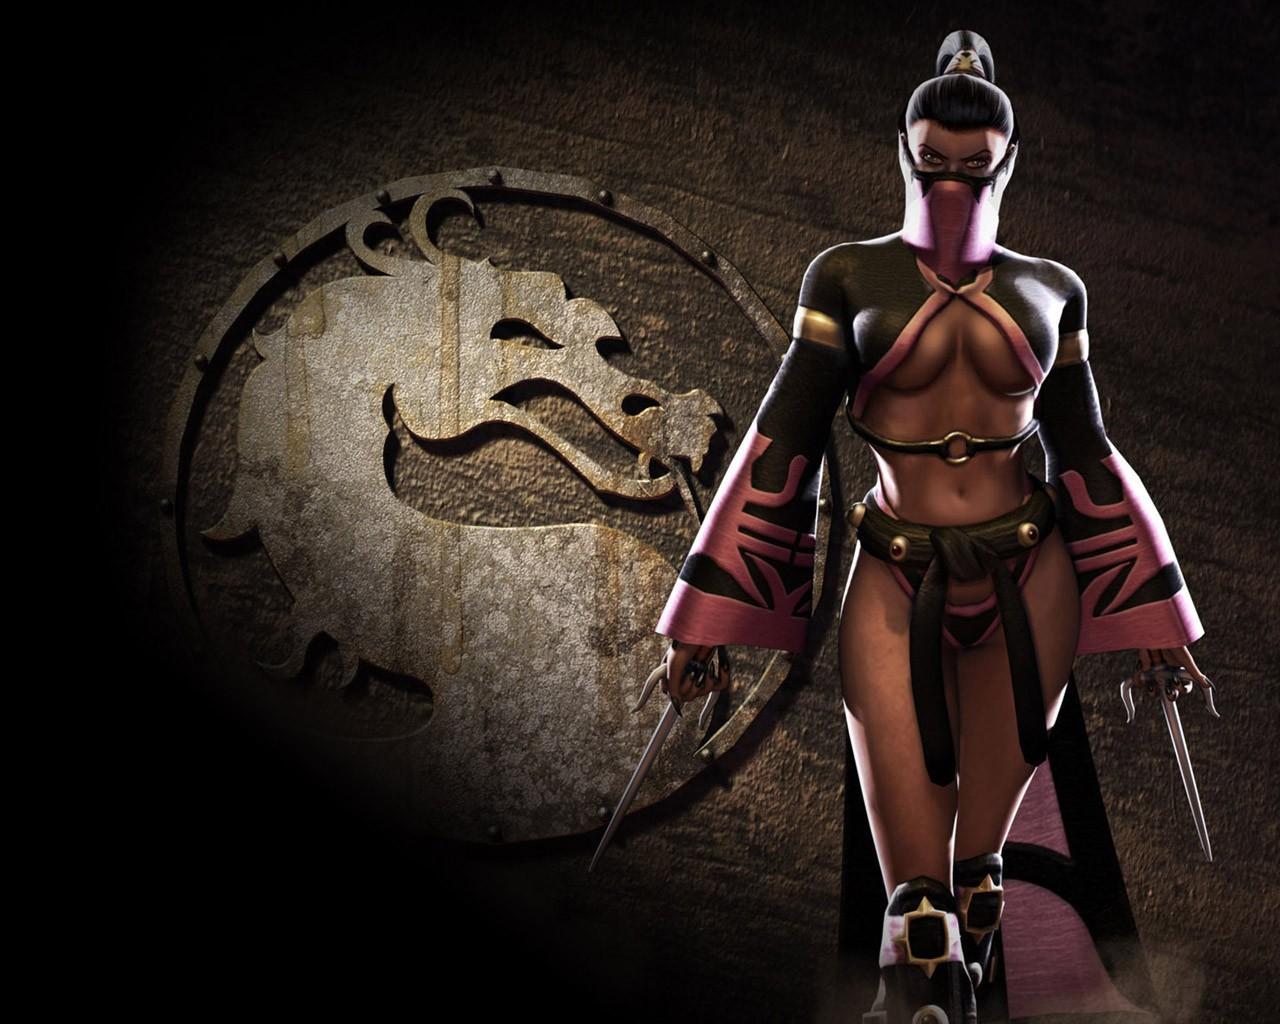 fantasy_art_Mortal_Kombat_Mileena_Mortal_Kombat_Deception_Mileena_Mortal_Kombat_video_games-350426